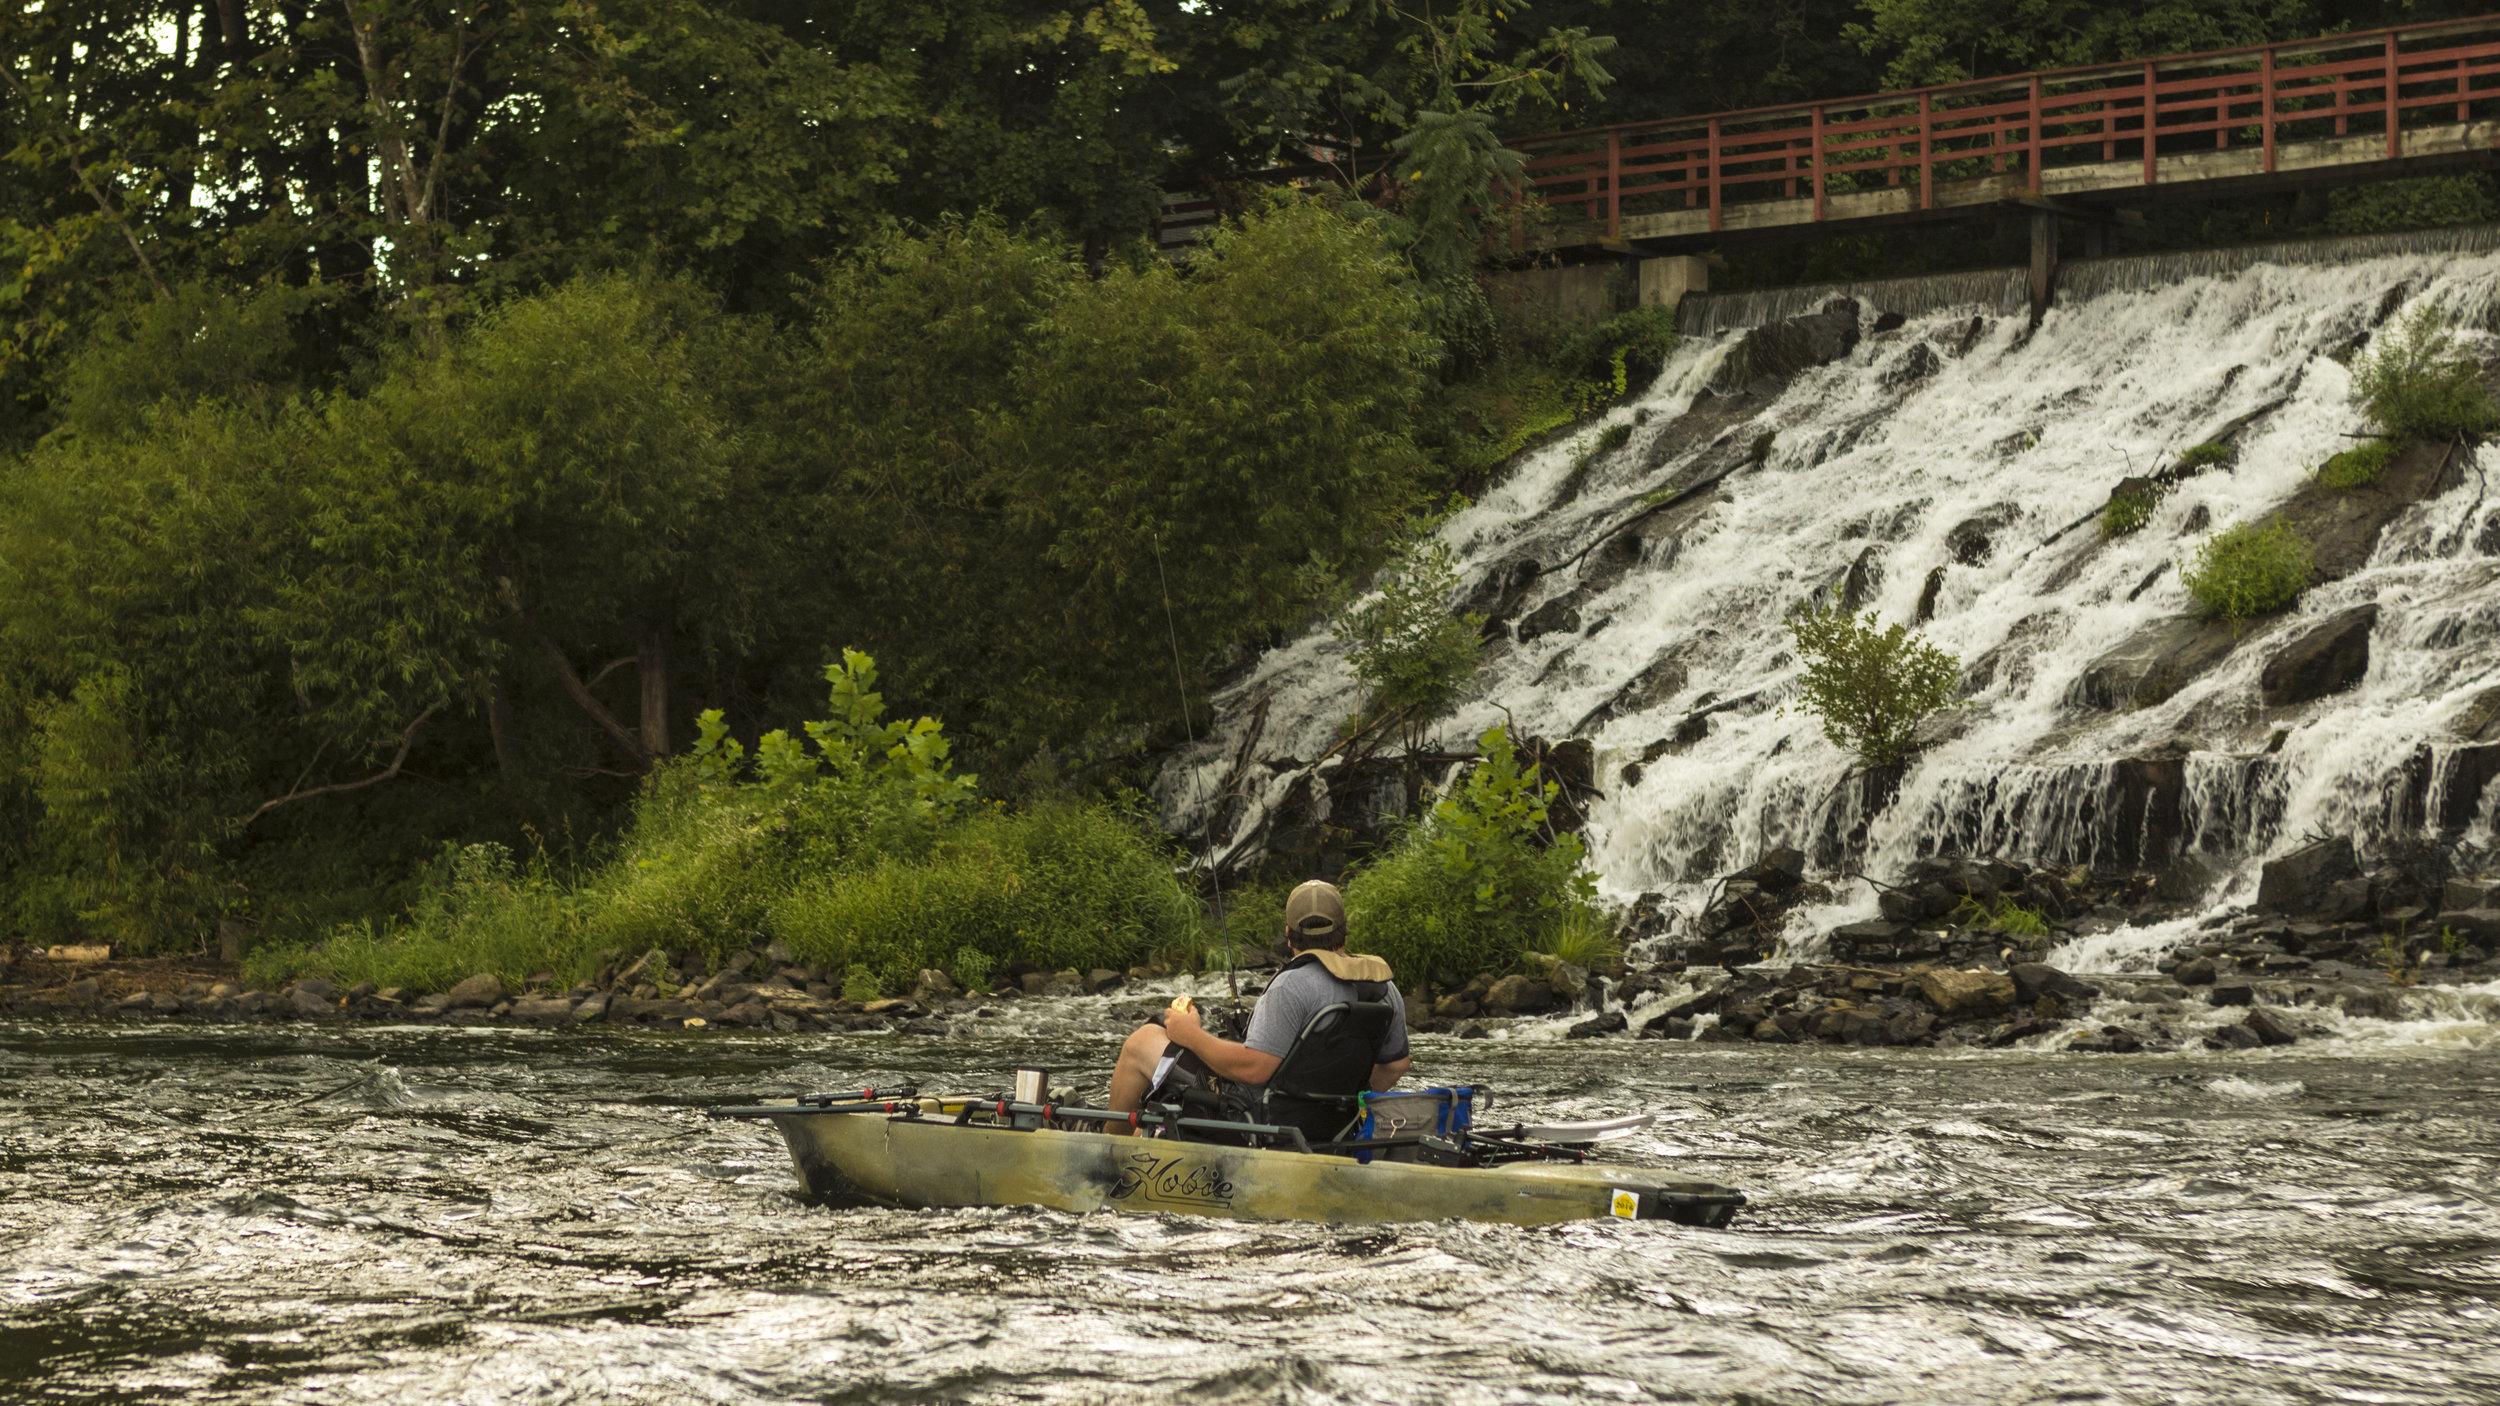 ProAngler12-action-fishing-camo-river-C1-waterfall-5706-full.jpg